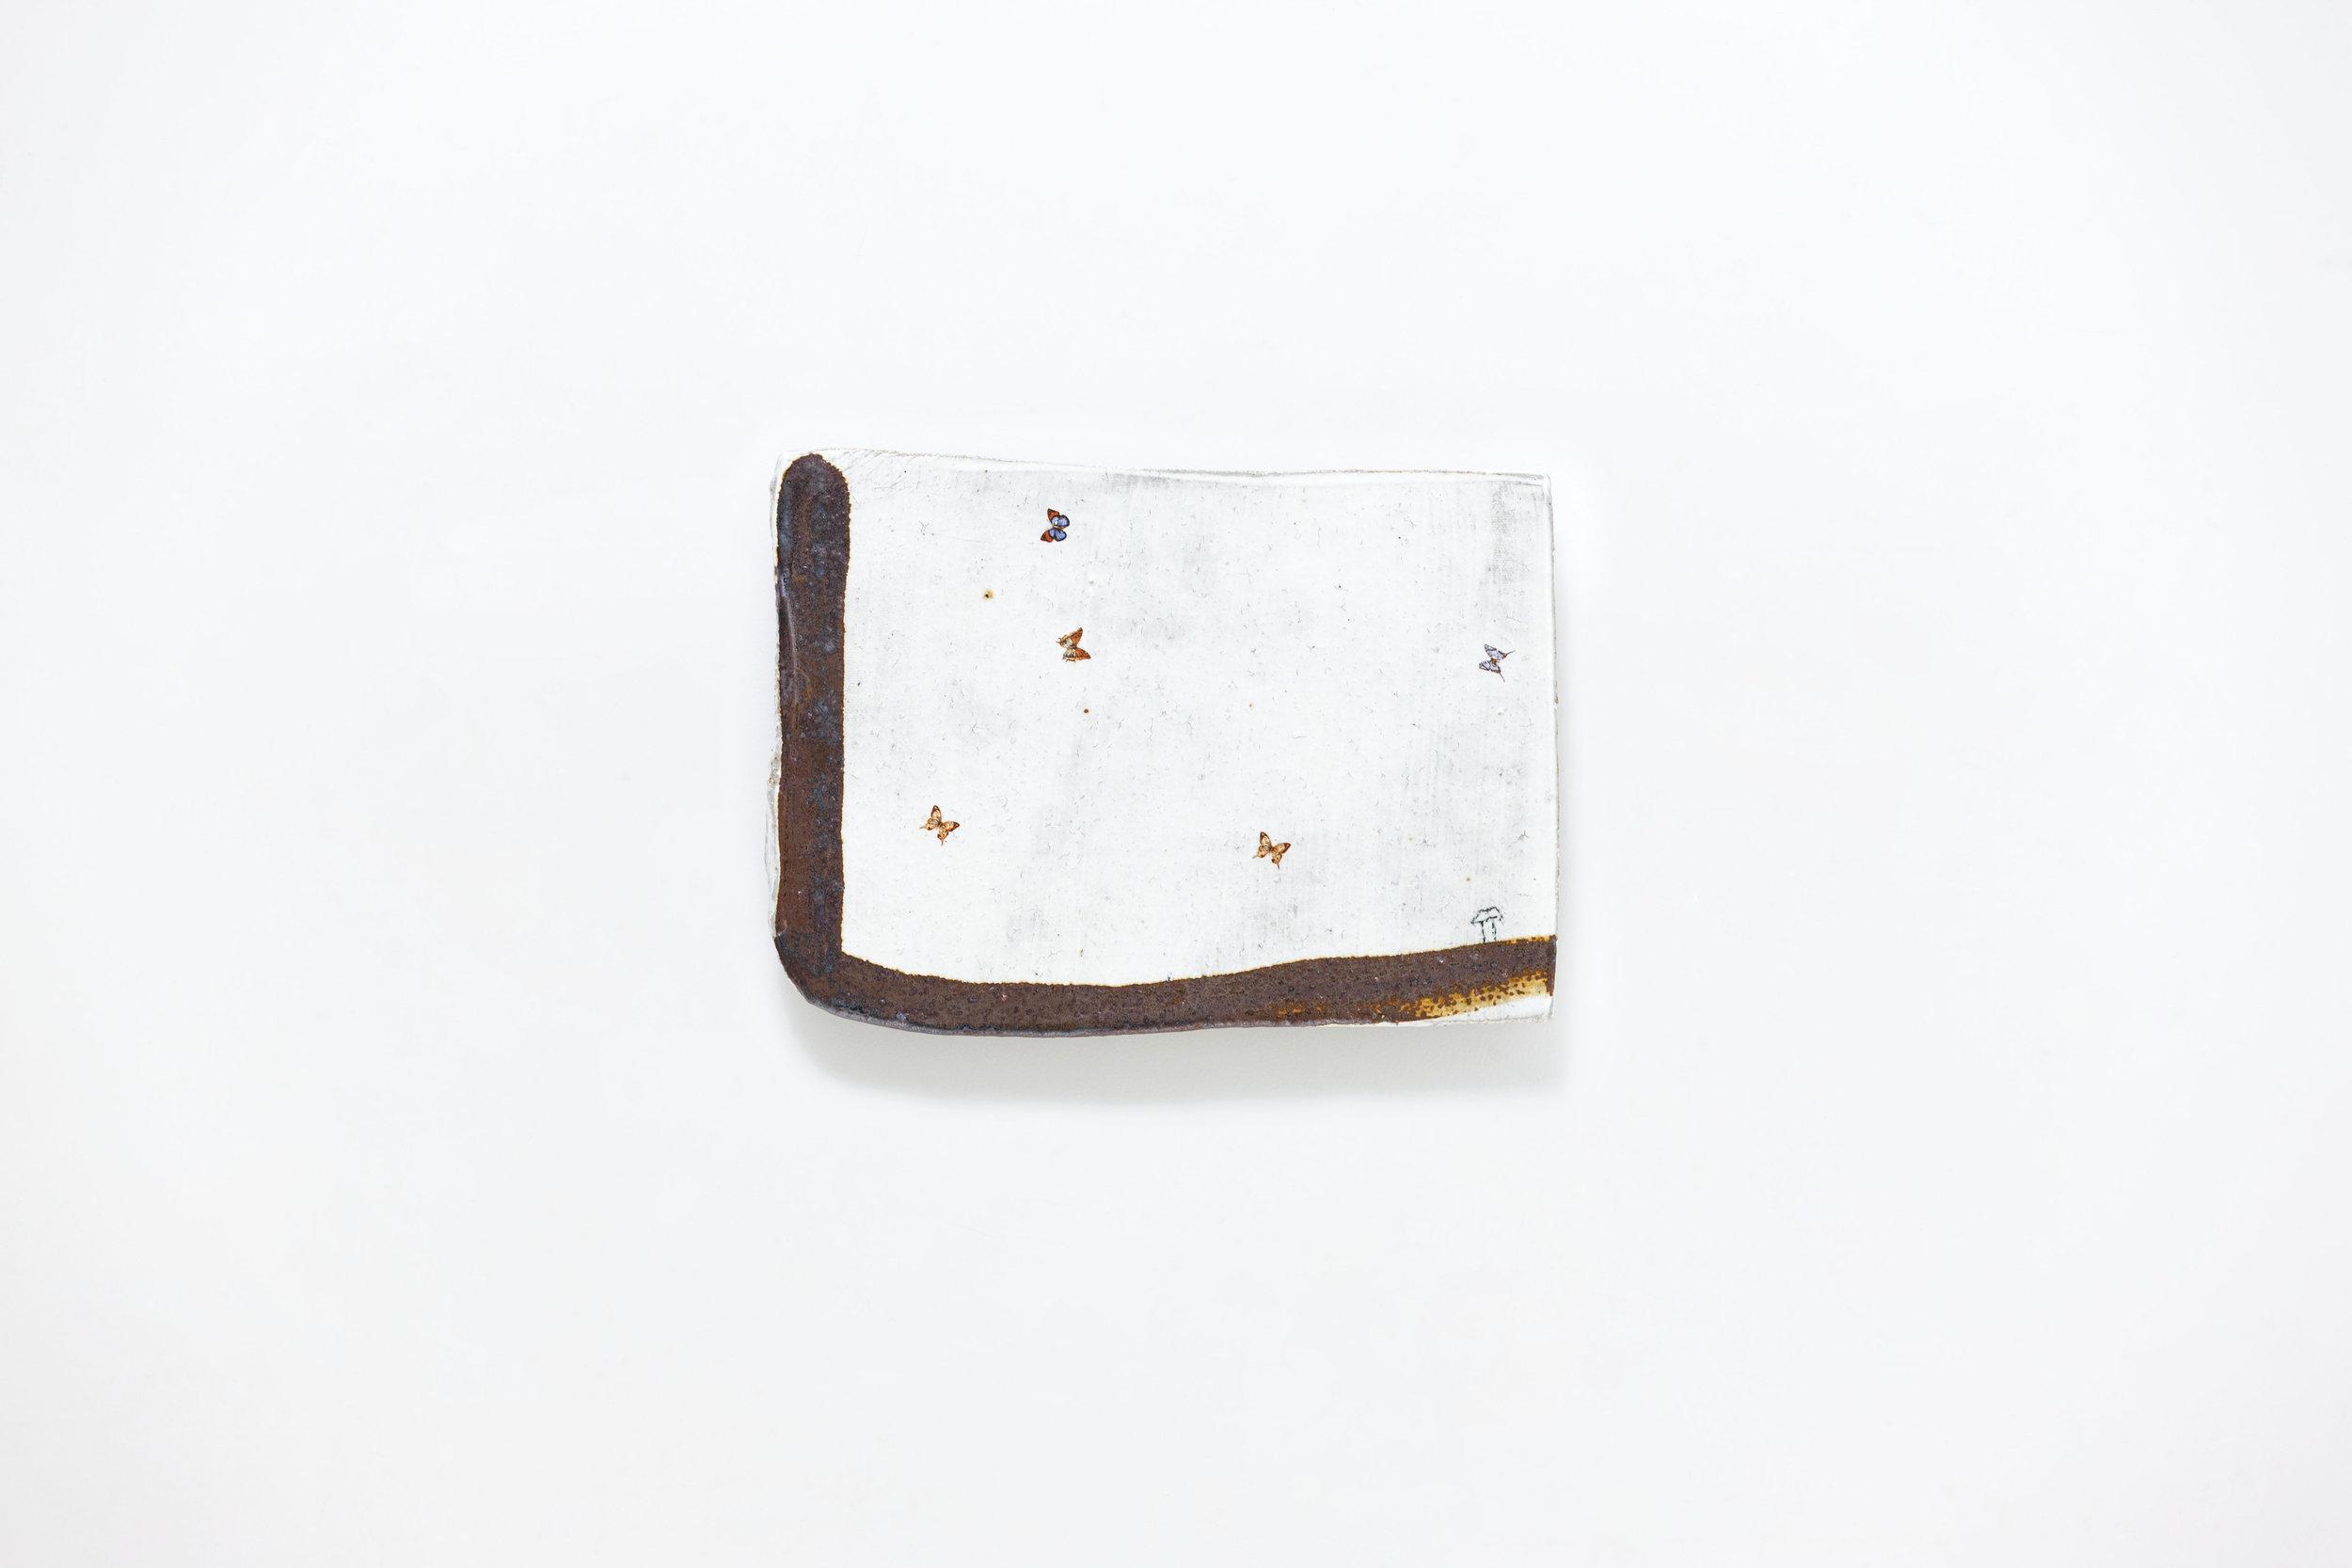 LEE Hun Chung,Bada 151110-31,Glazed Ceramic,30W x 1D x 22H cm,11.81W x 0.39D x 8.66H inch ,2015.jpg